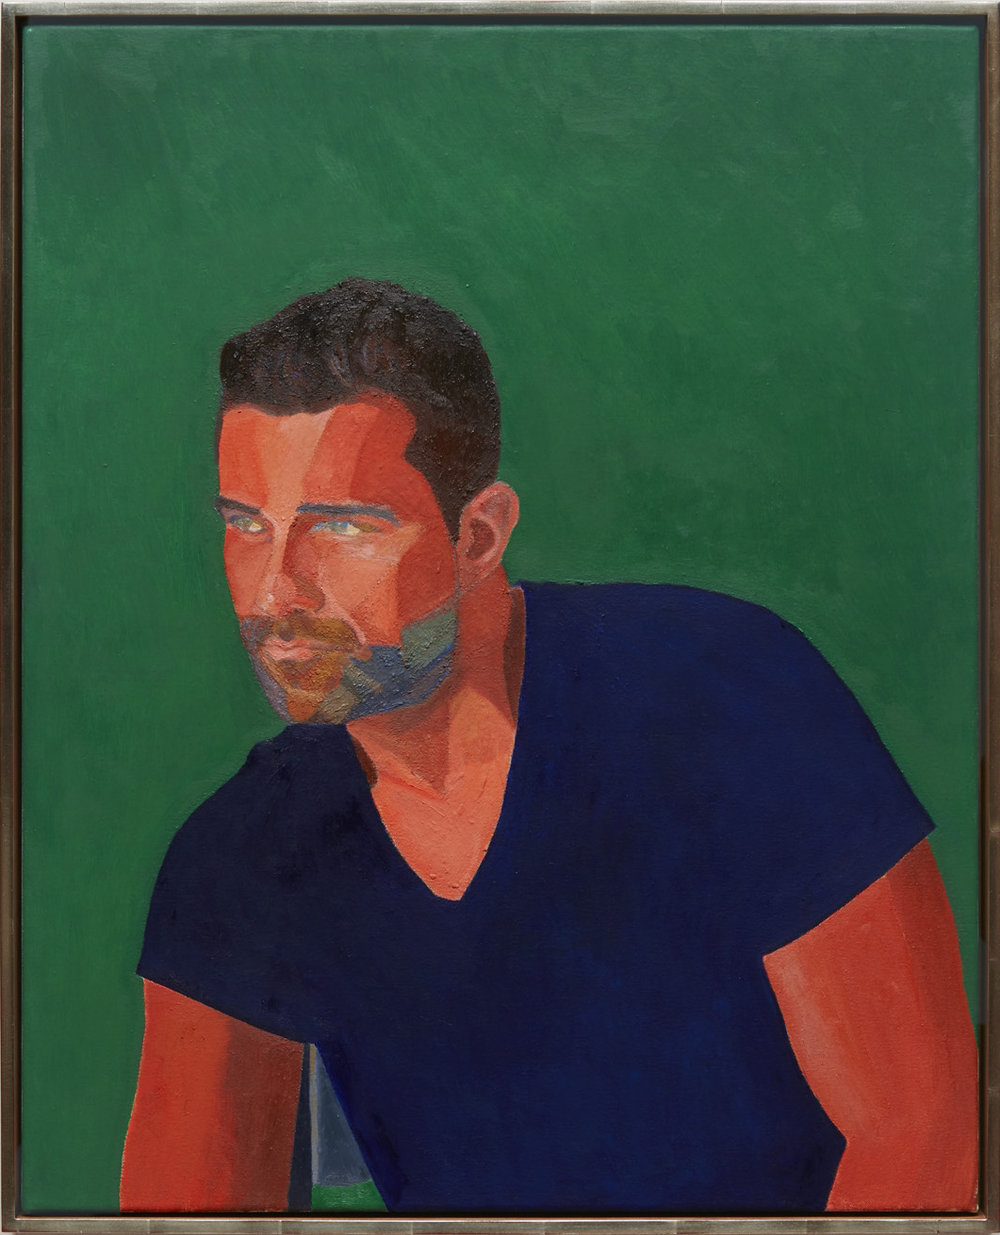 Rubin Singer - oil on canvas, 30 x 24